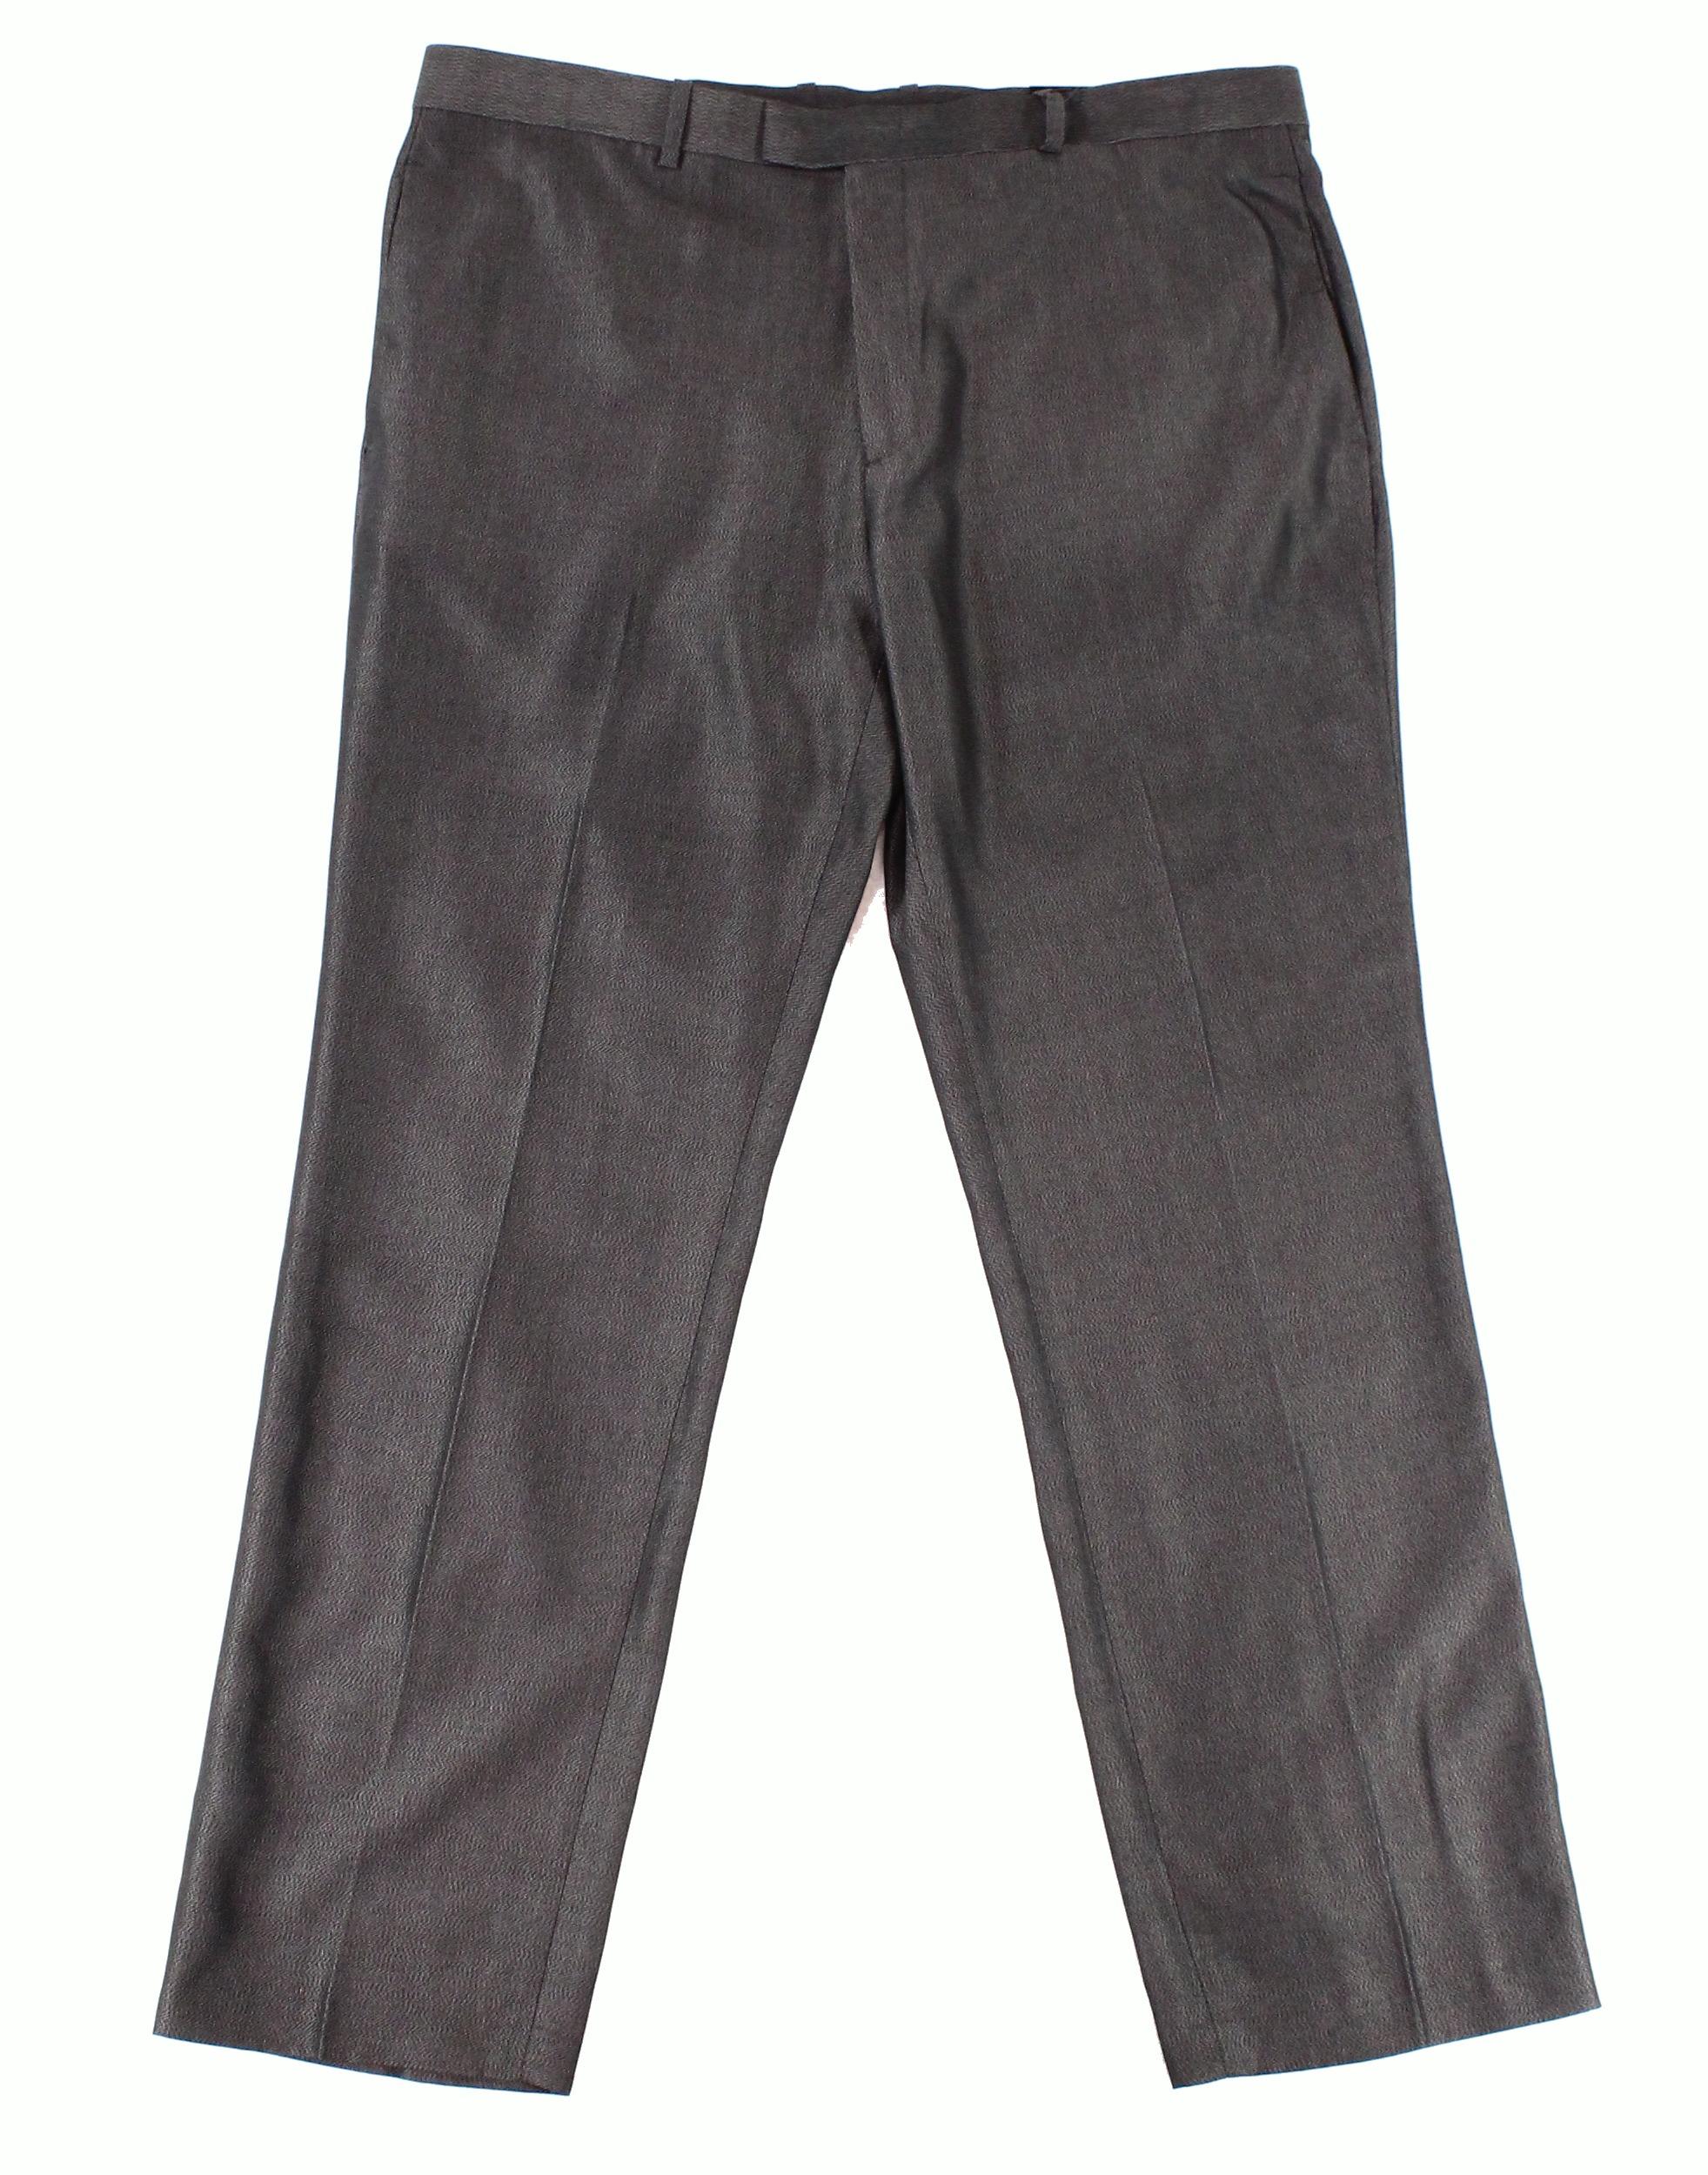 Alfani NEW Black Mens Size 38X32 Embossed Dress Flat Front Pants